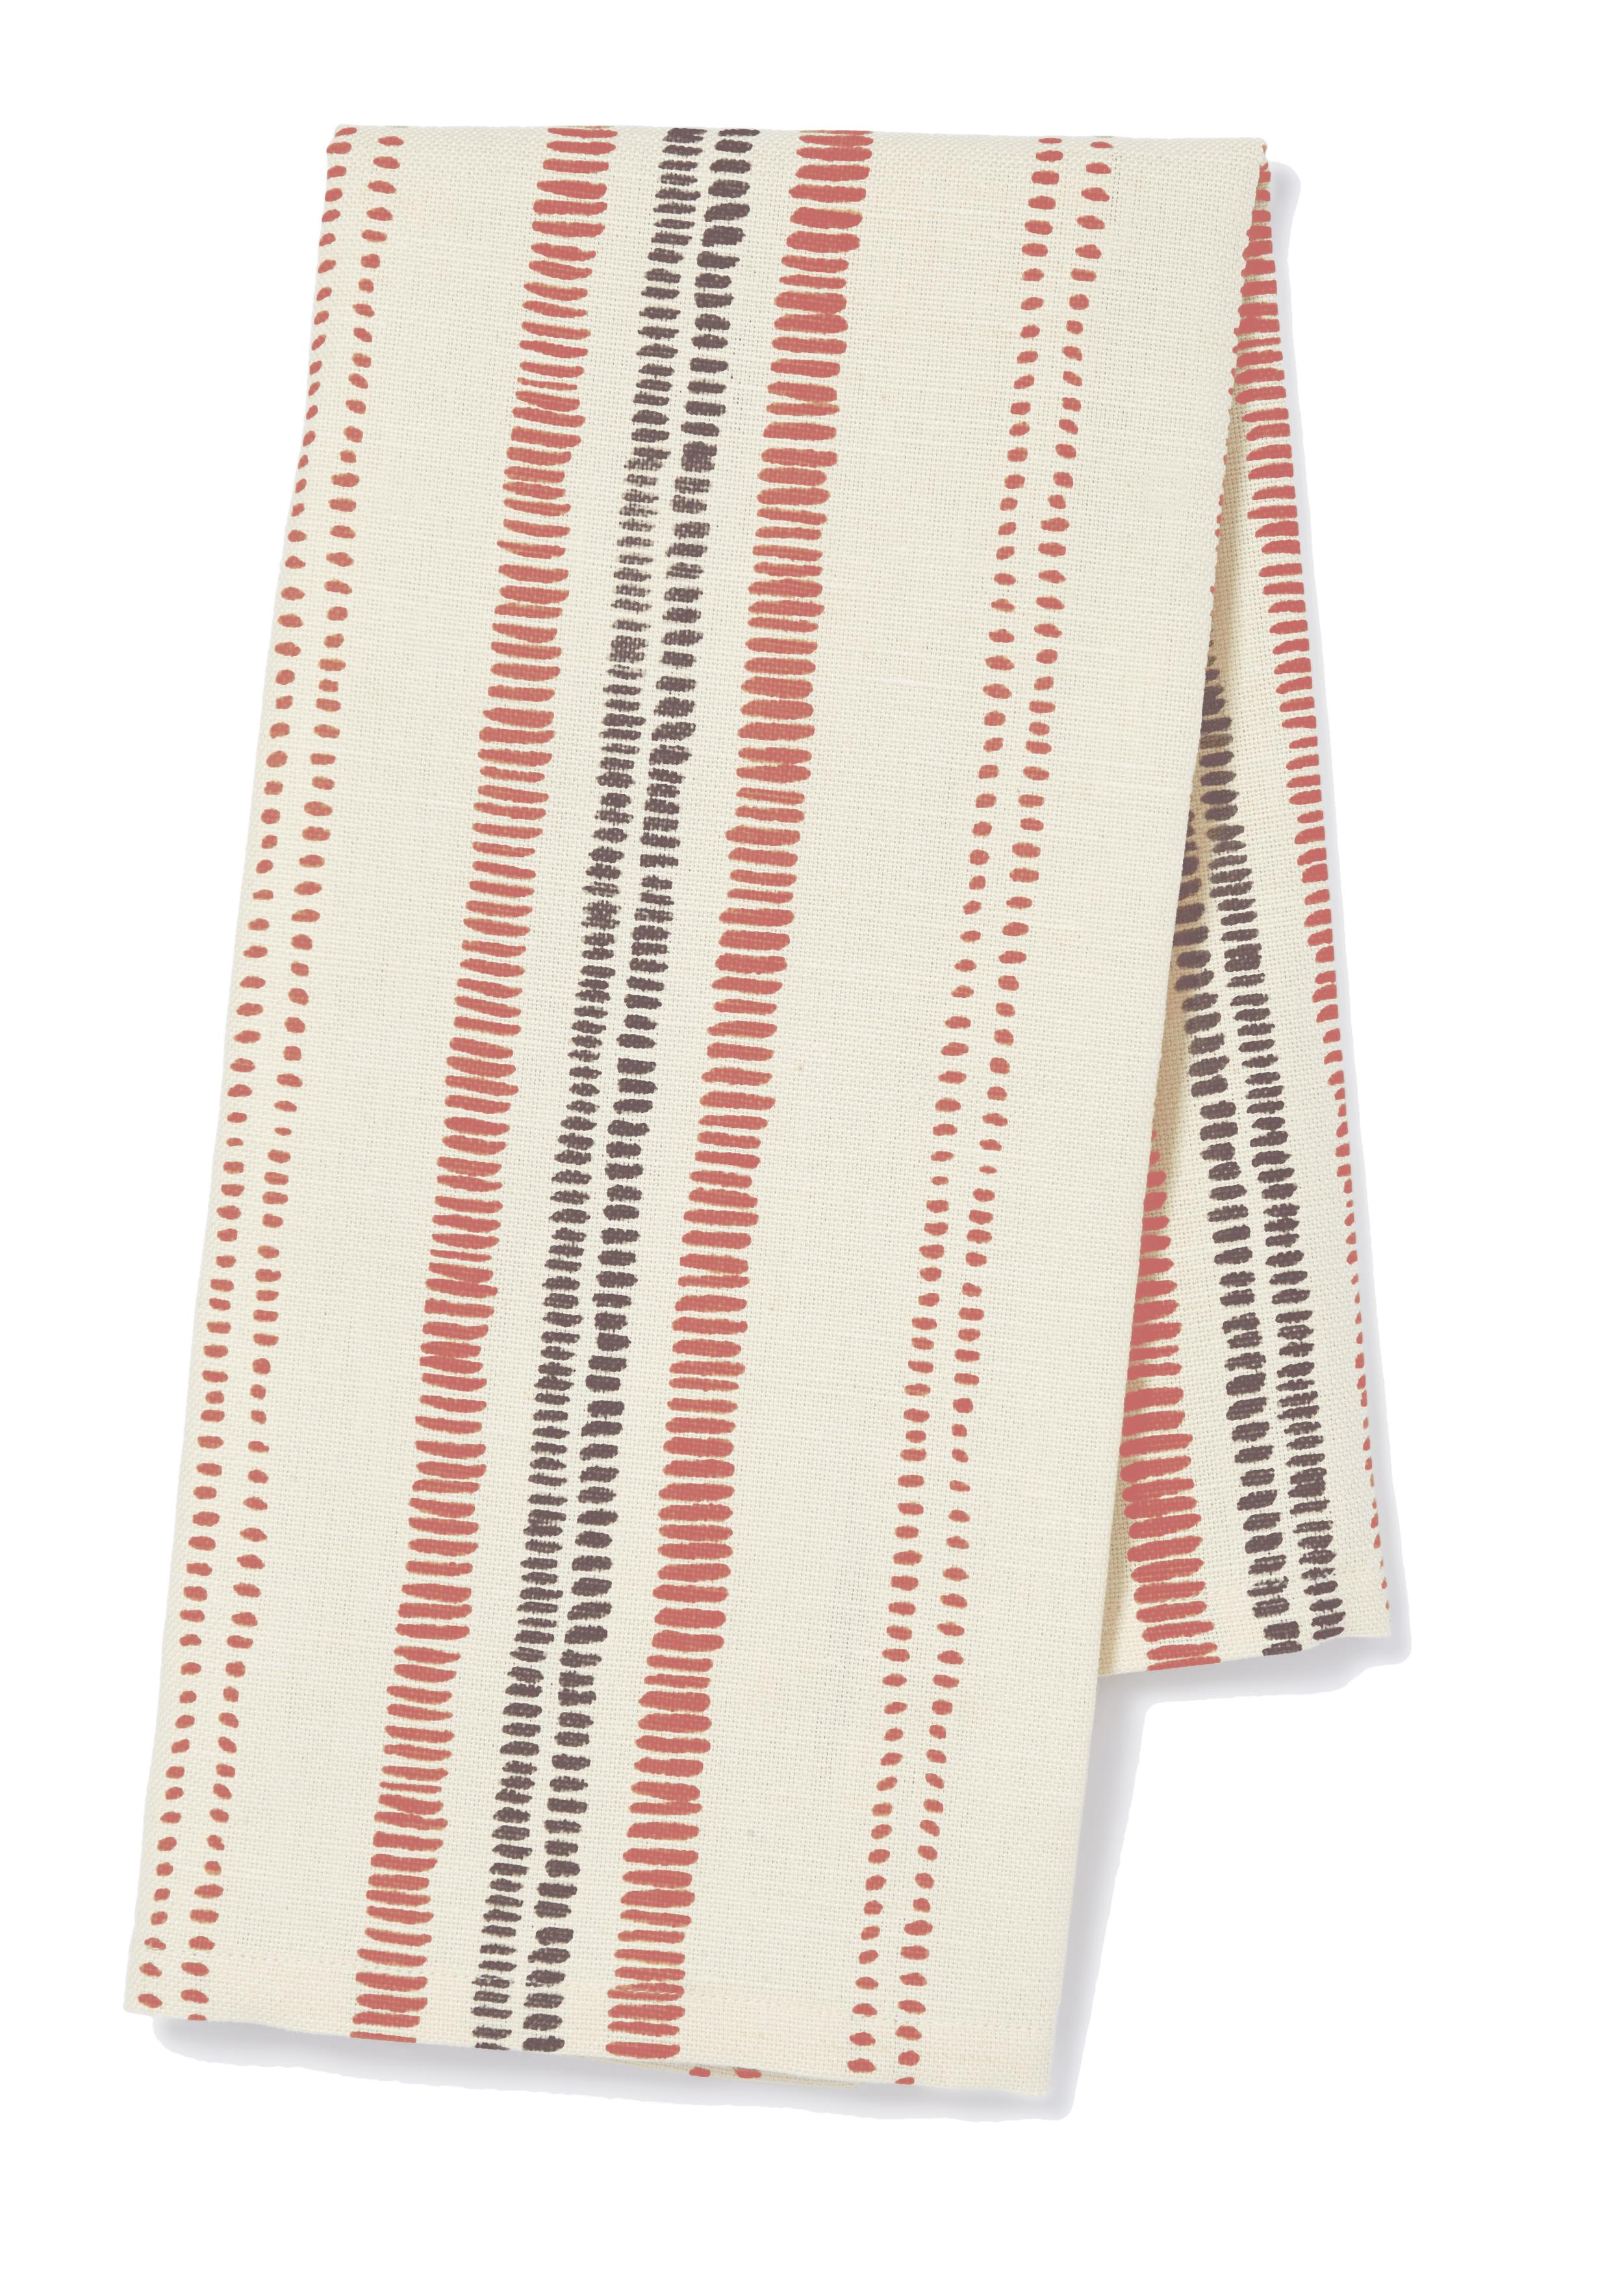 RART04_Berry Plum Railroad Tea Towel.jpg